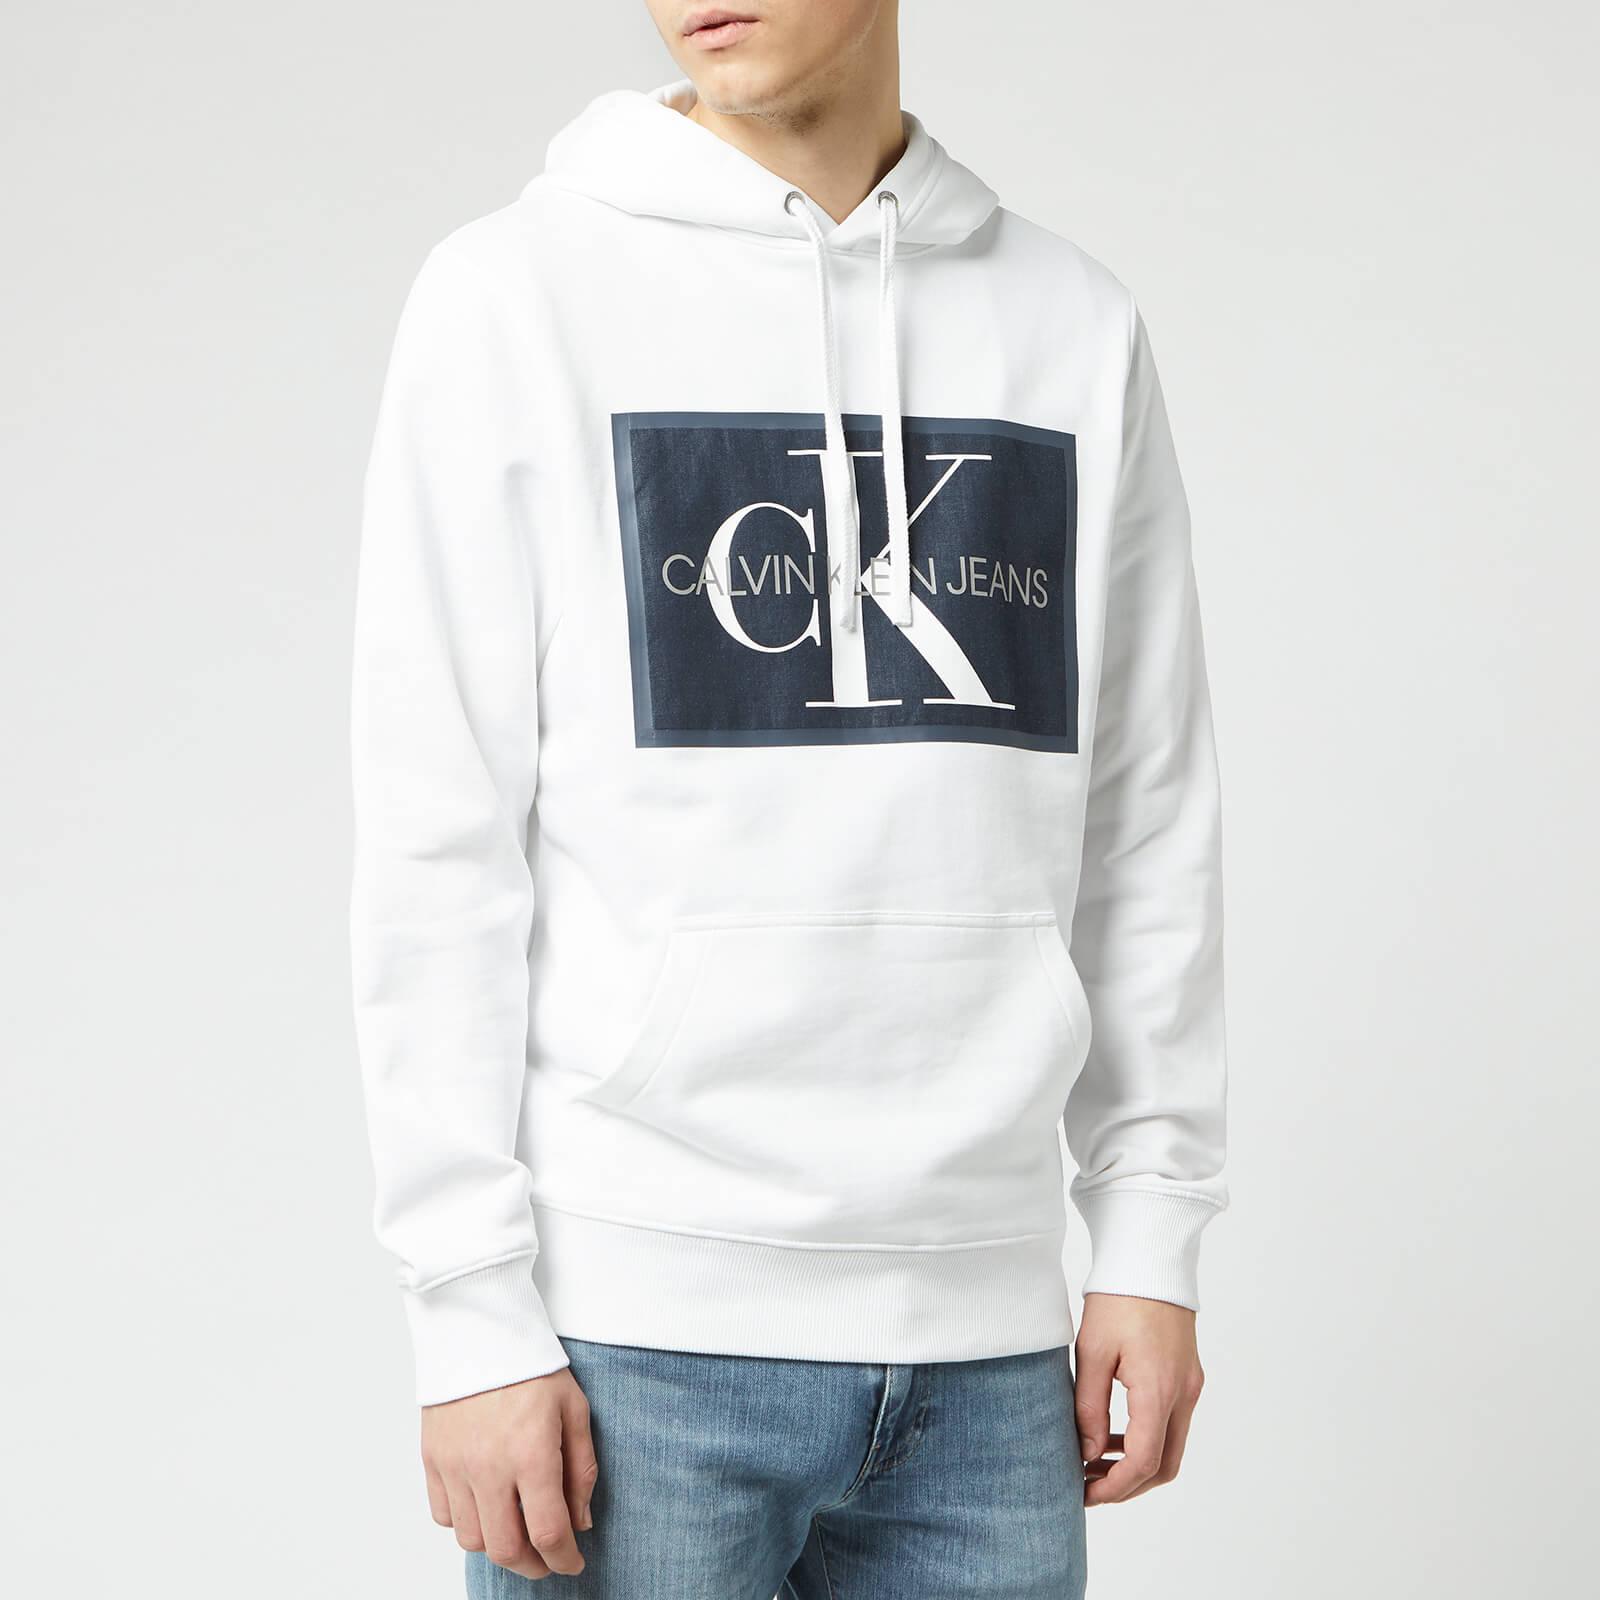 Calvin Klein Jeans Men's Monogram Patch Hoodie - Bright White - XXL - White